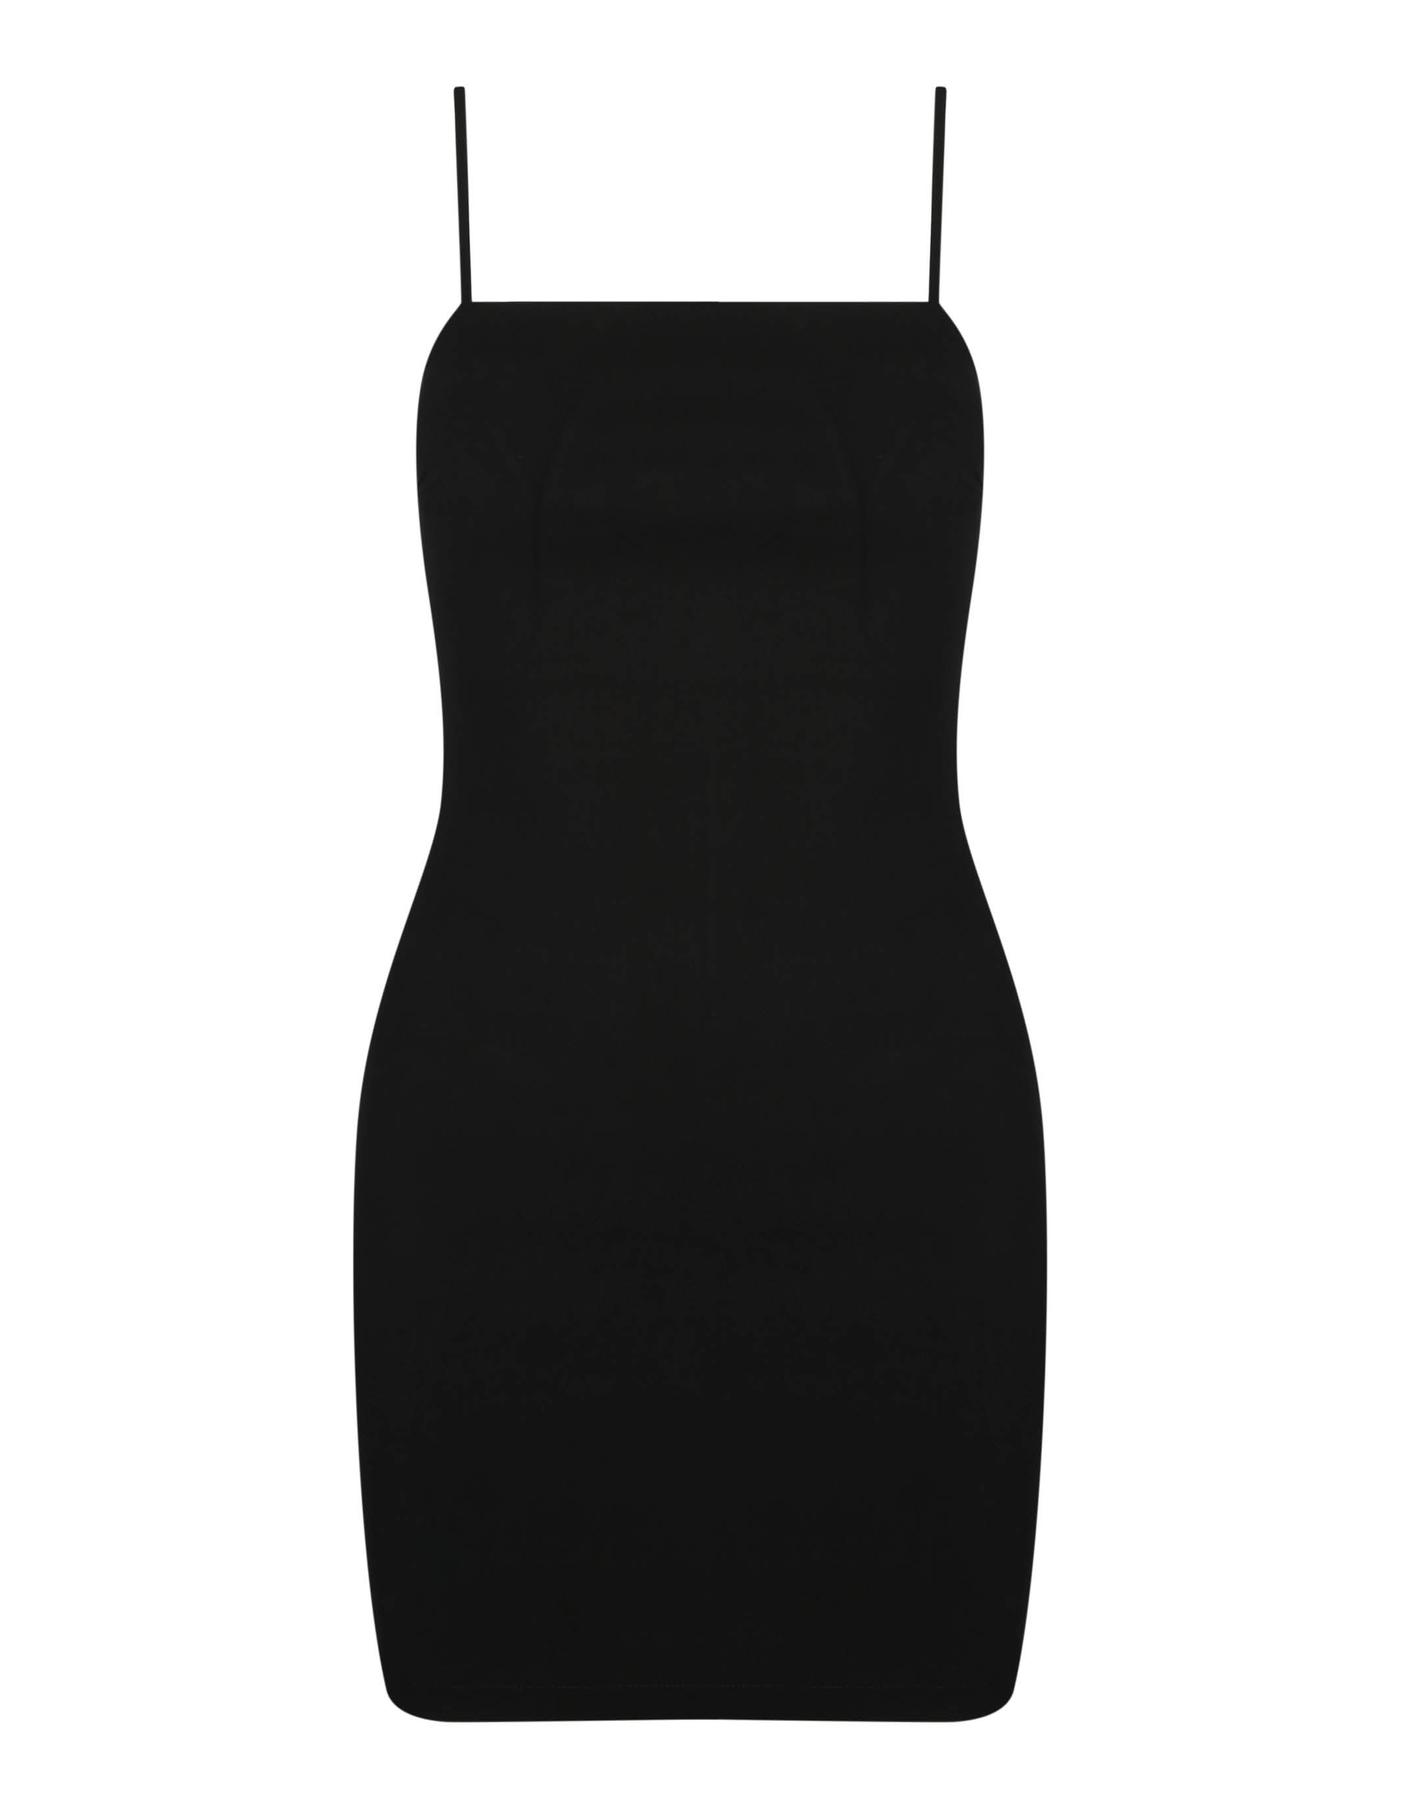 Schwarzes, figurbetontes Trägerkleid